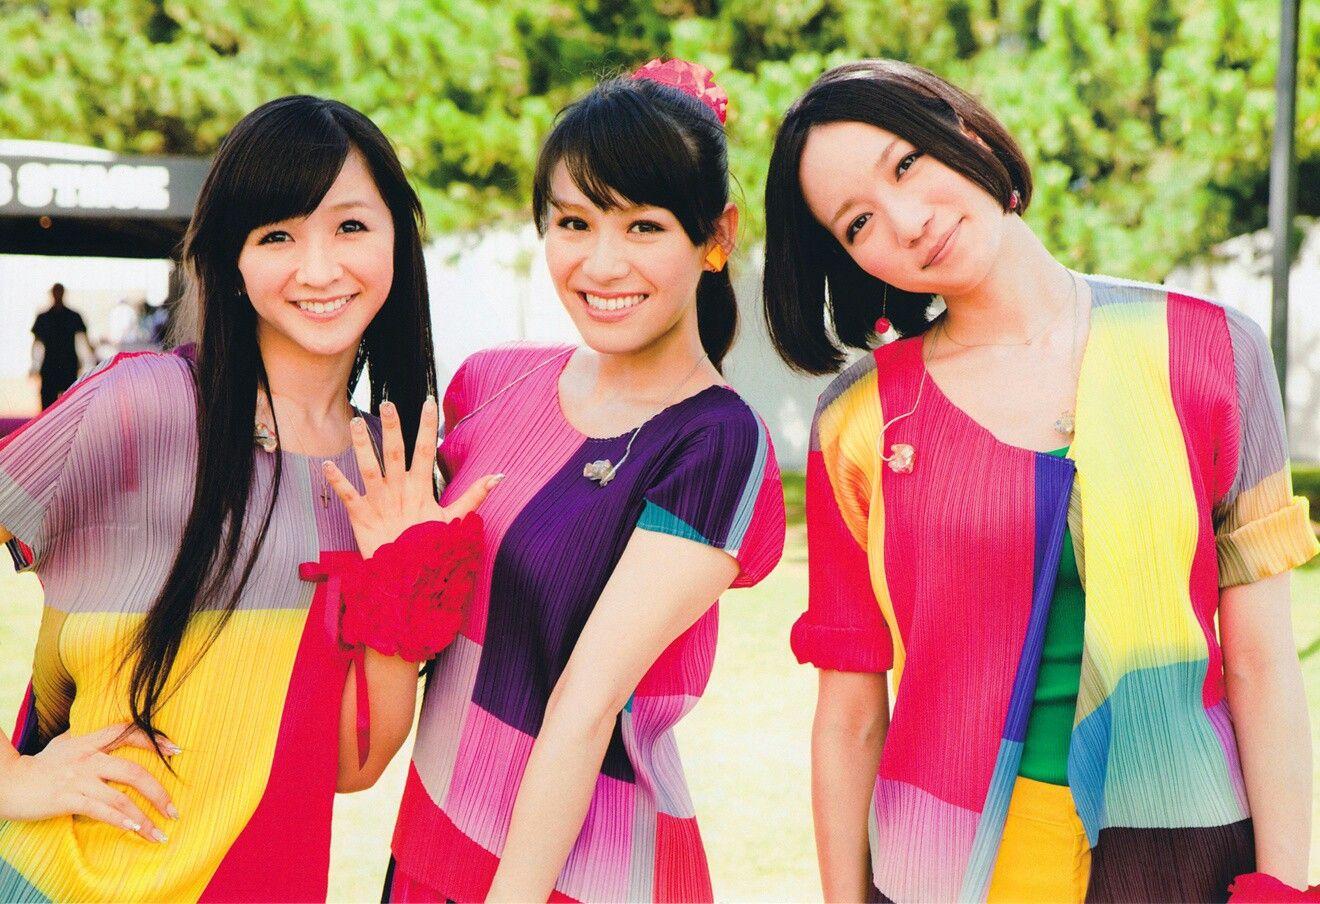 perfume3人仲良し笑顔の壁紙